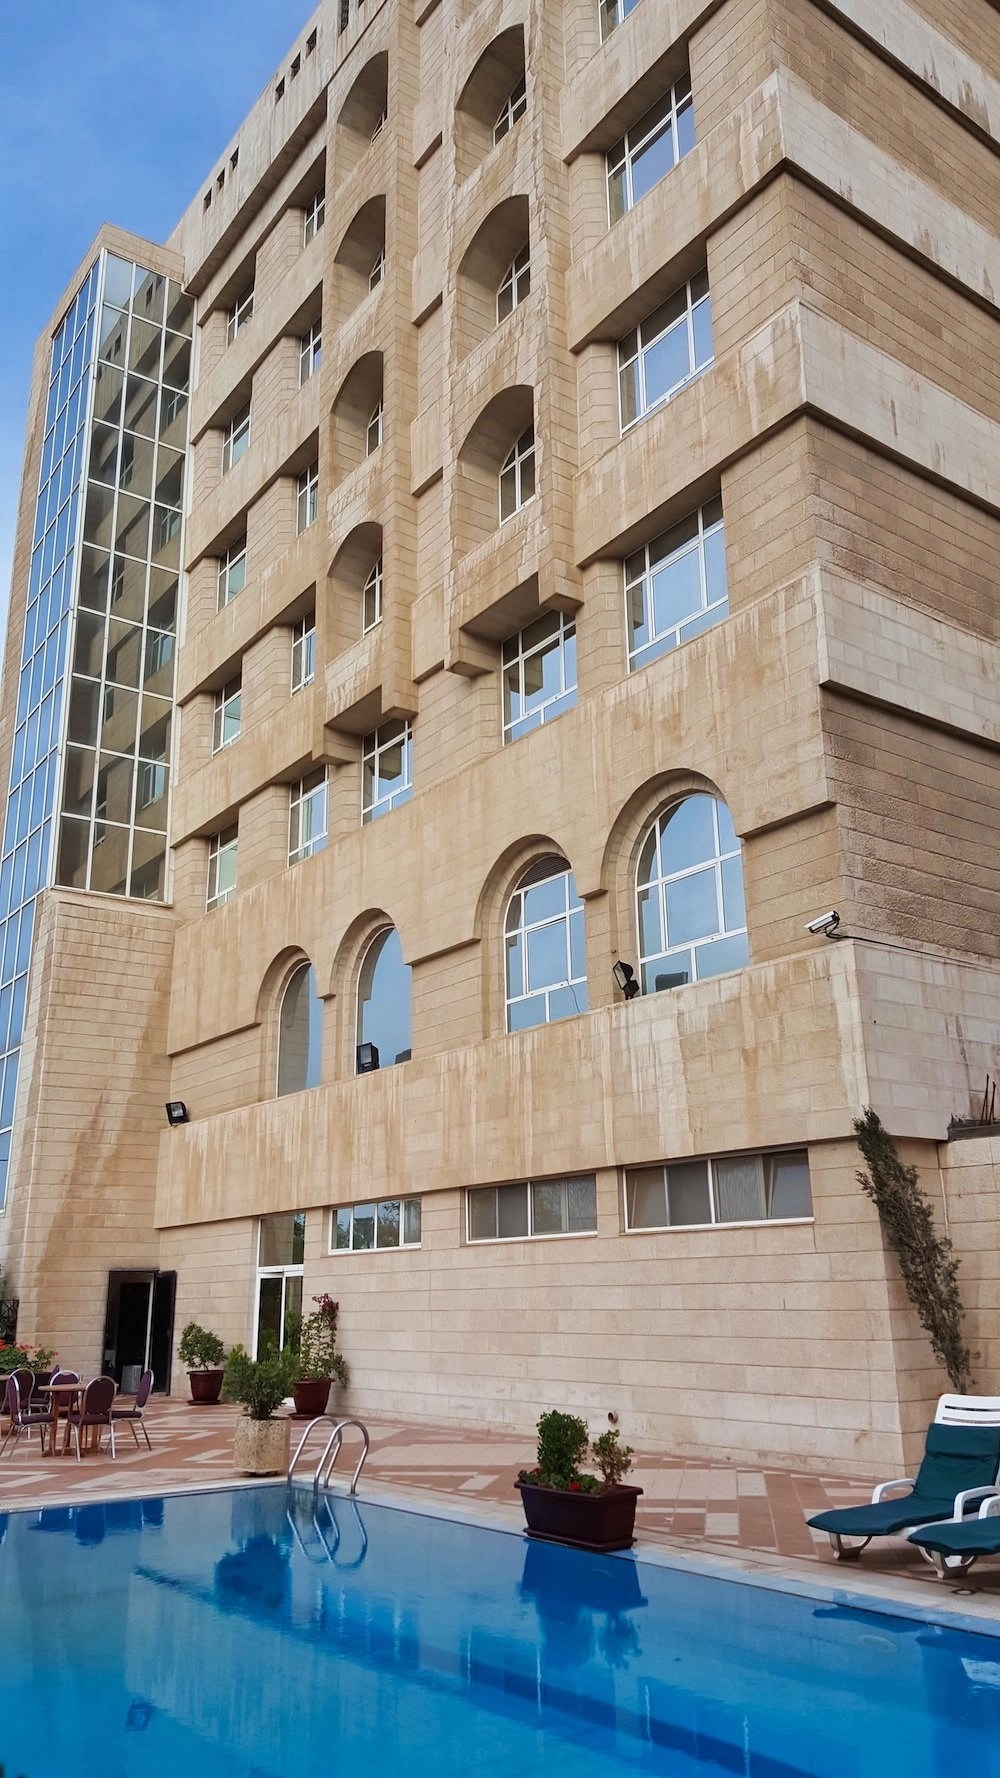 Jordan Hotels - Hotel Exterior & Pool